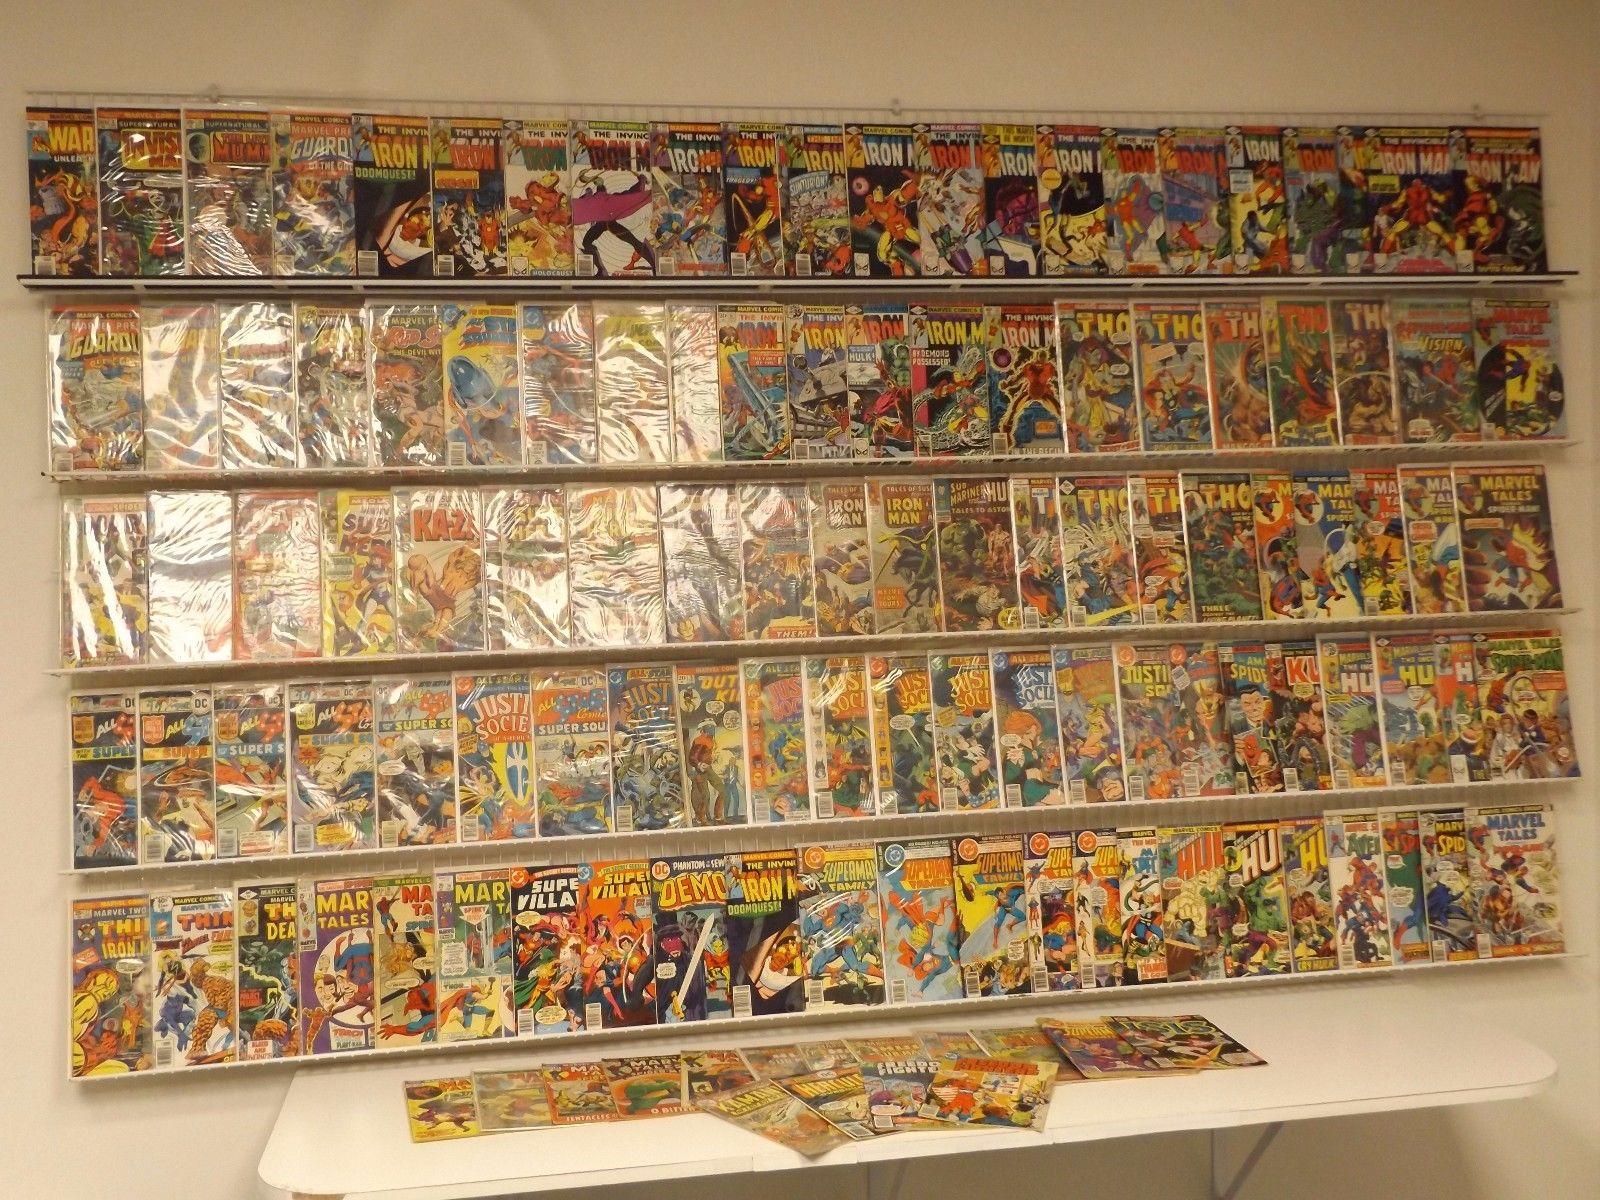 Huge Lot of 120 Silver/Bronze comics w/ Iron Man, Thor, Incredible Hulk & more